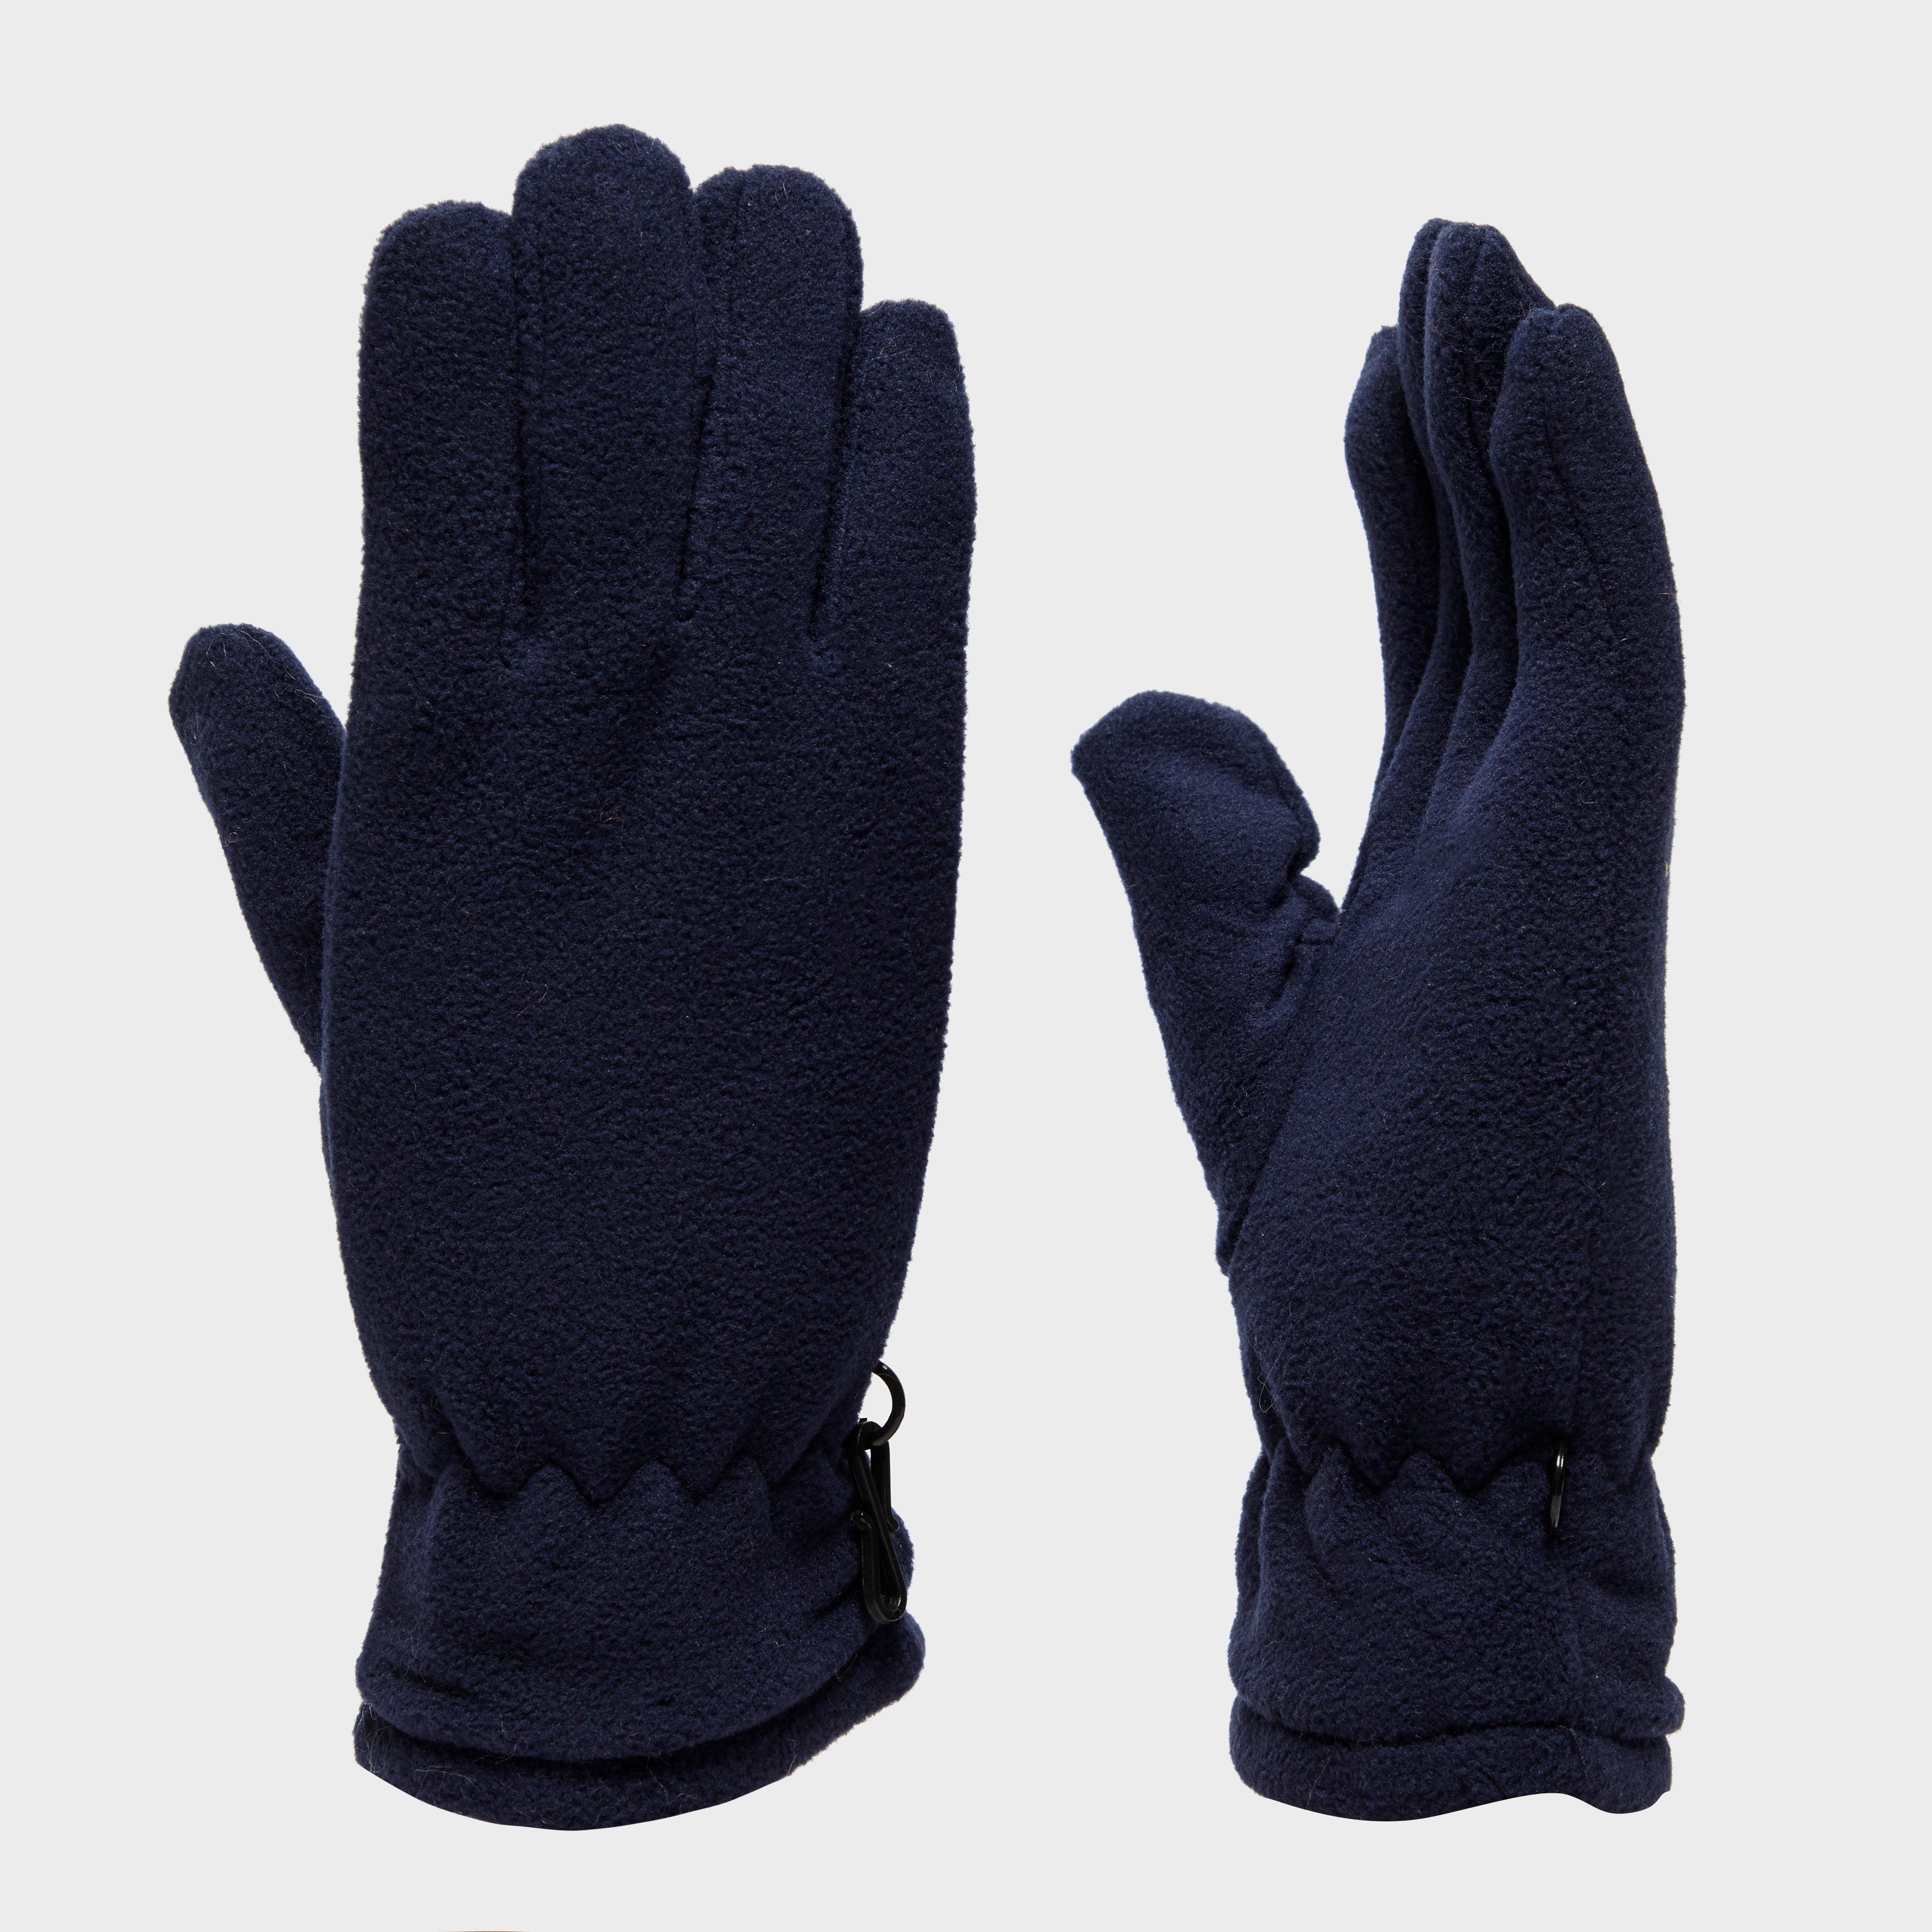 Peter Storm Unisex Thinsulate Fleece Gloves - Navy, Navy